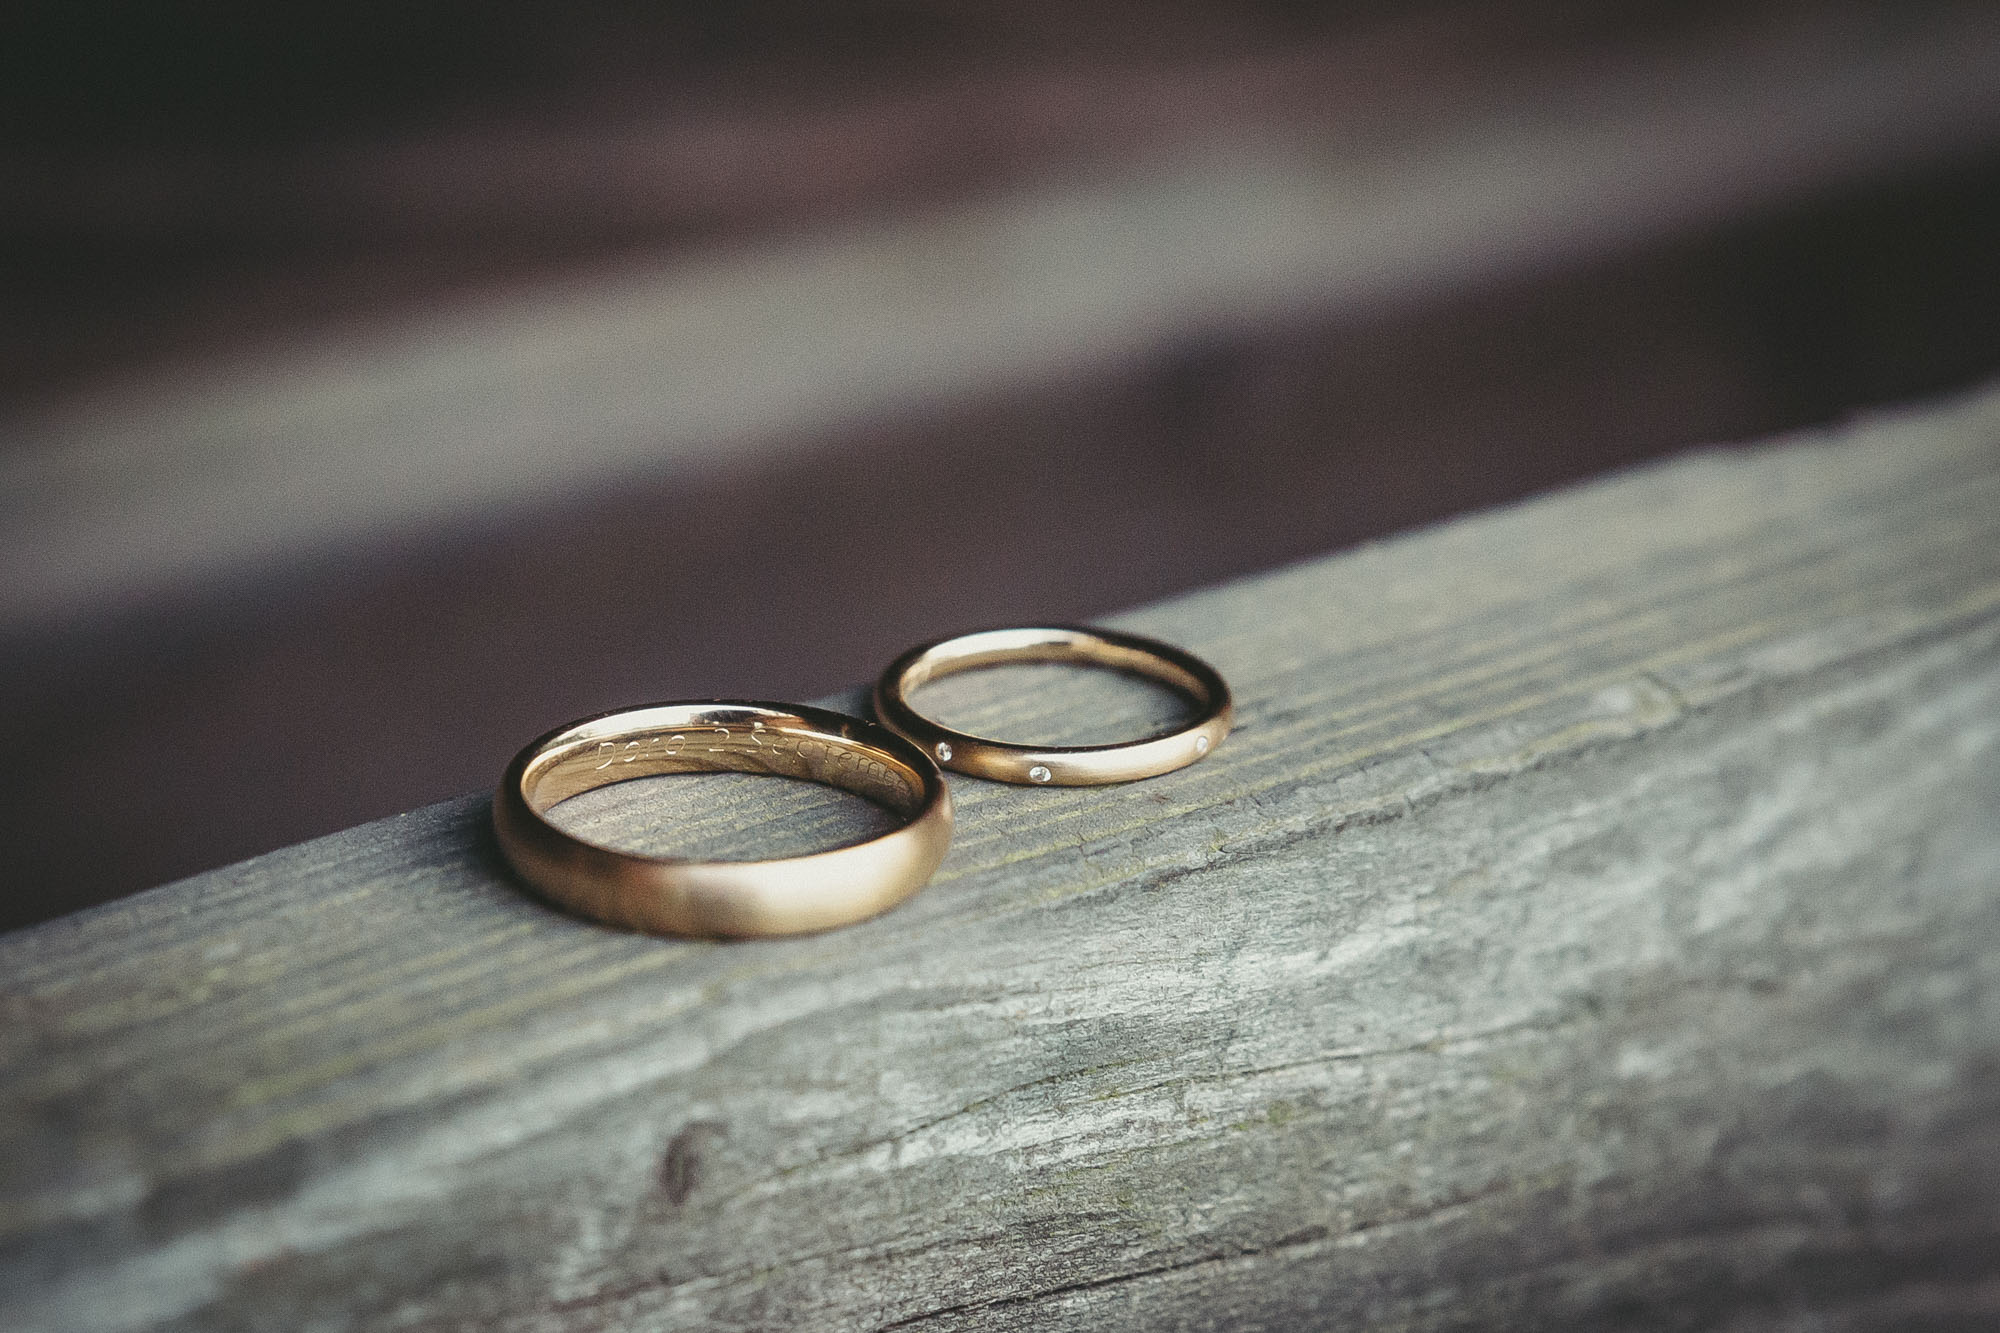 Hochzeitsfotografie-Tuebingen-Doro-Stefan-17-2